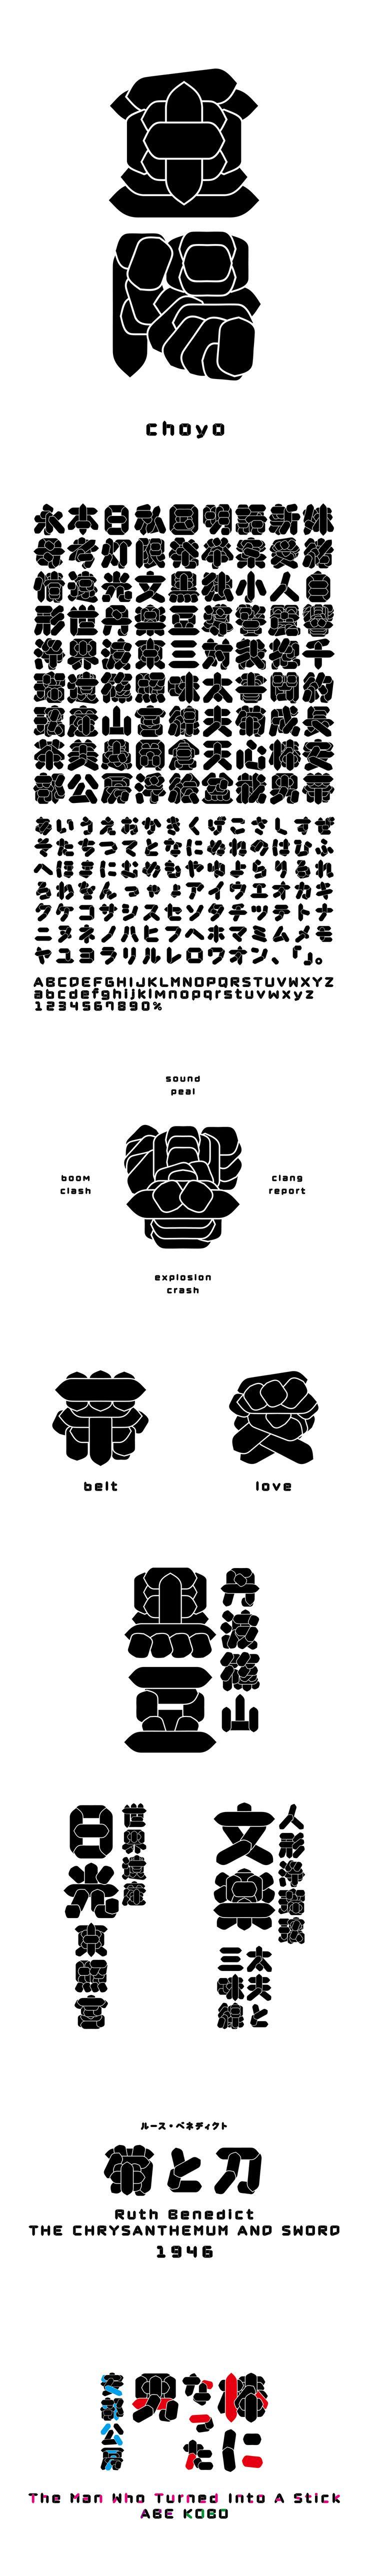 Choyo : Aug. 2014 | Font | Bronze Prize, Morisawa Type Design Competition 2014, Kanji Category | Bronze Pencil, 2015 ONE SHOW